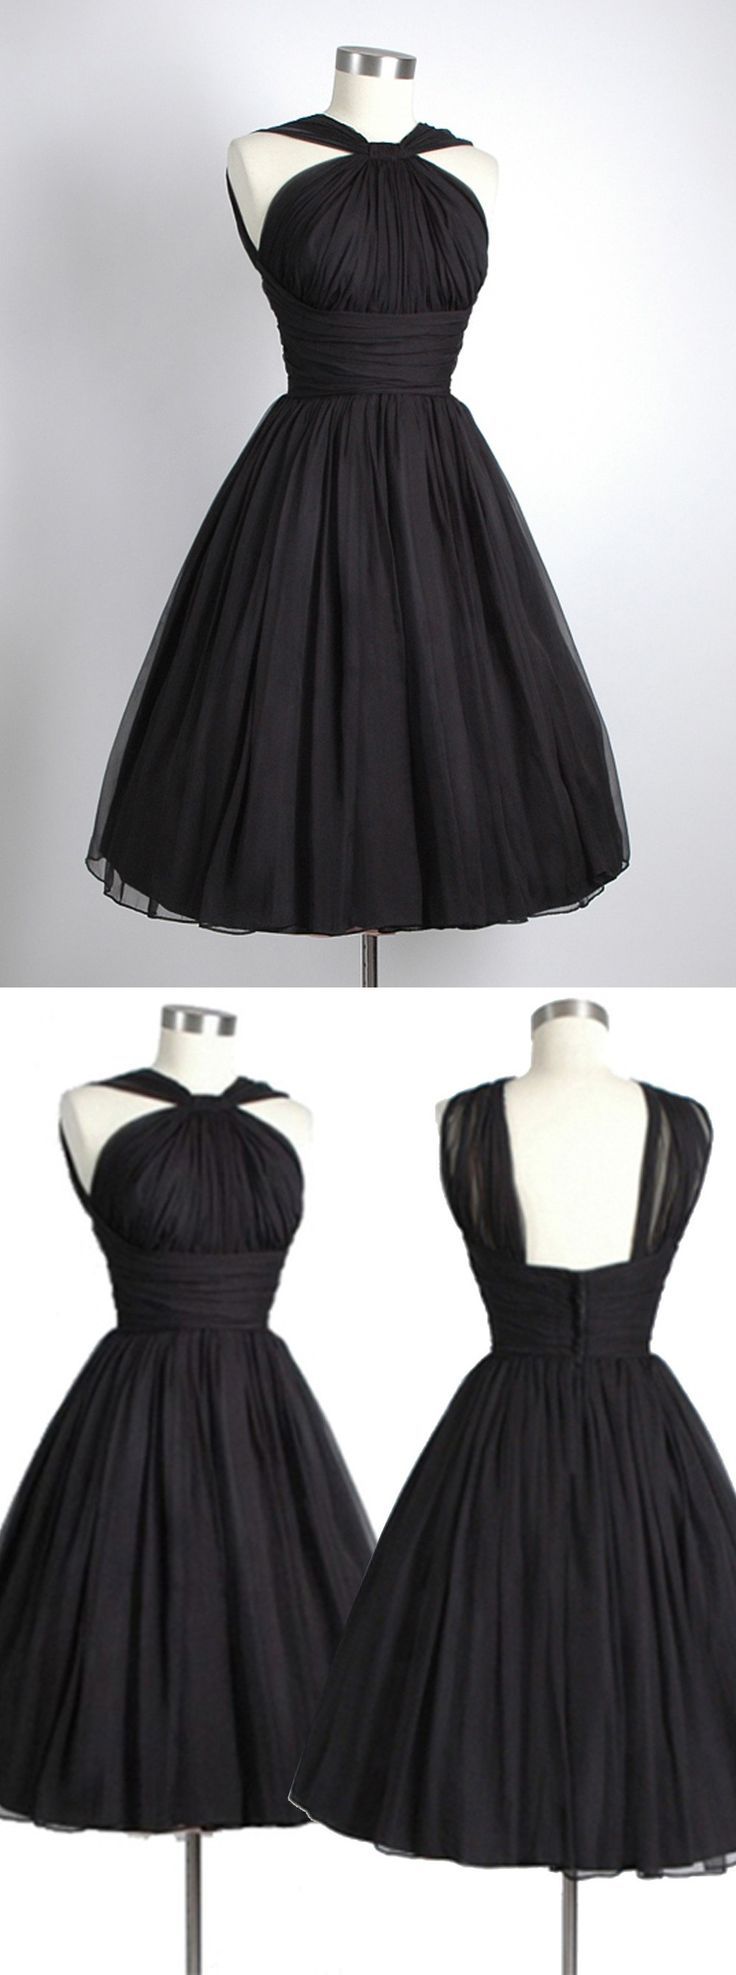 2016 homecoming dress, little black dress, 1950s vintage dress, party dress